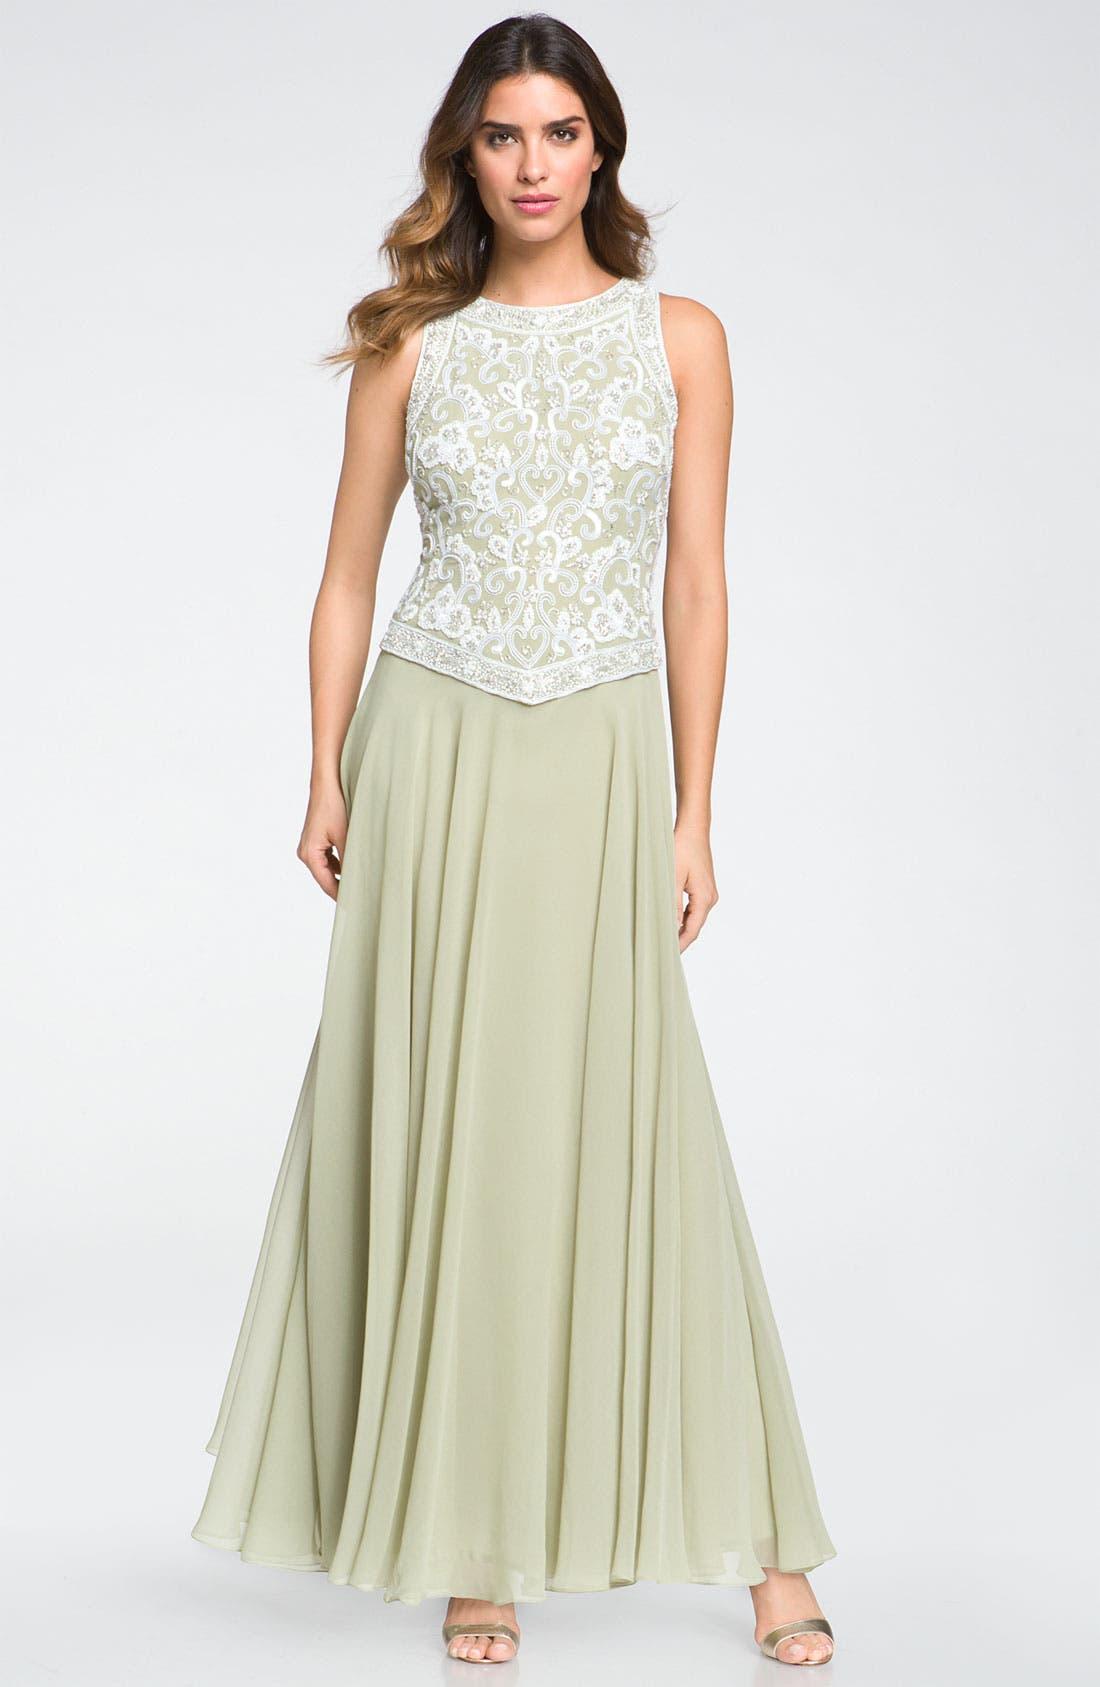 Main Image - J Kara Embellished Sleeveless Crepe Gown